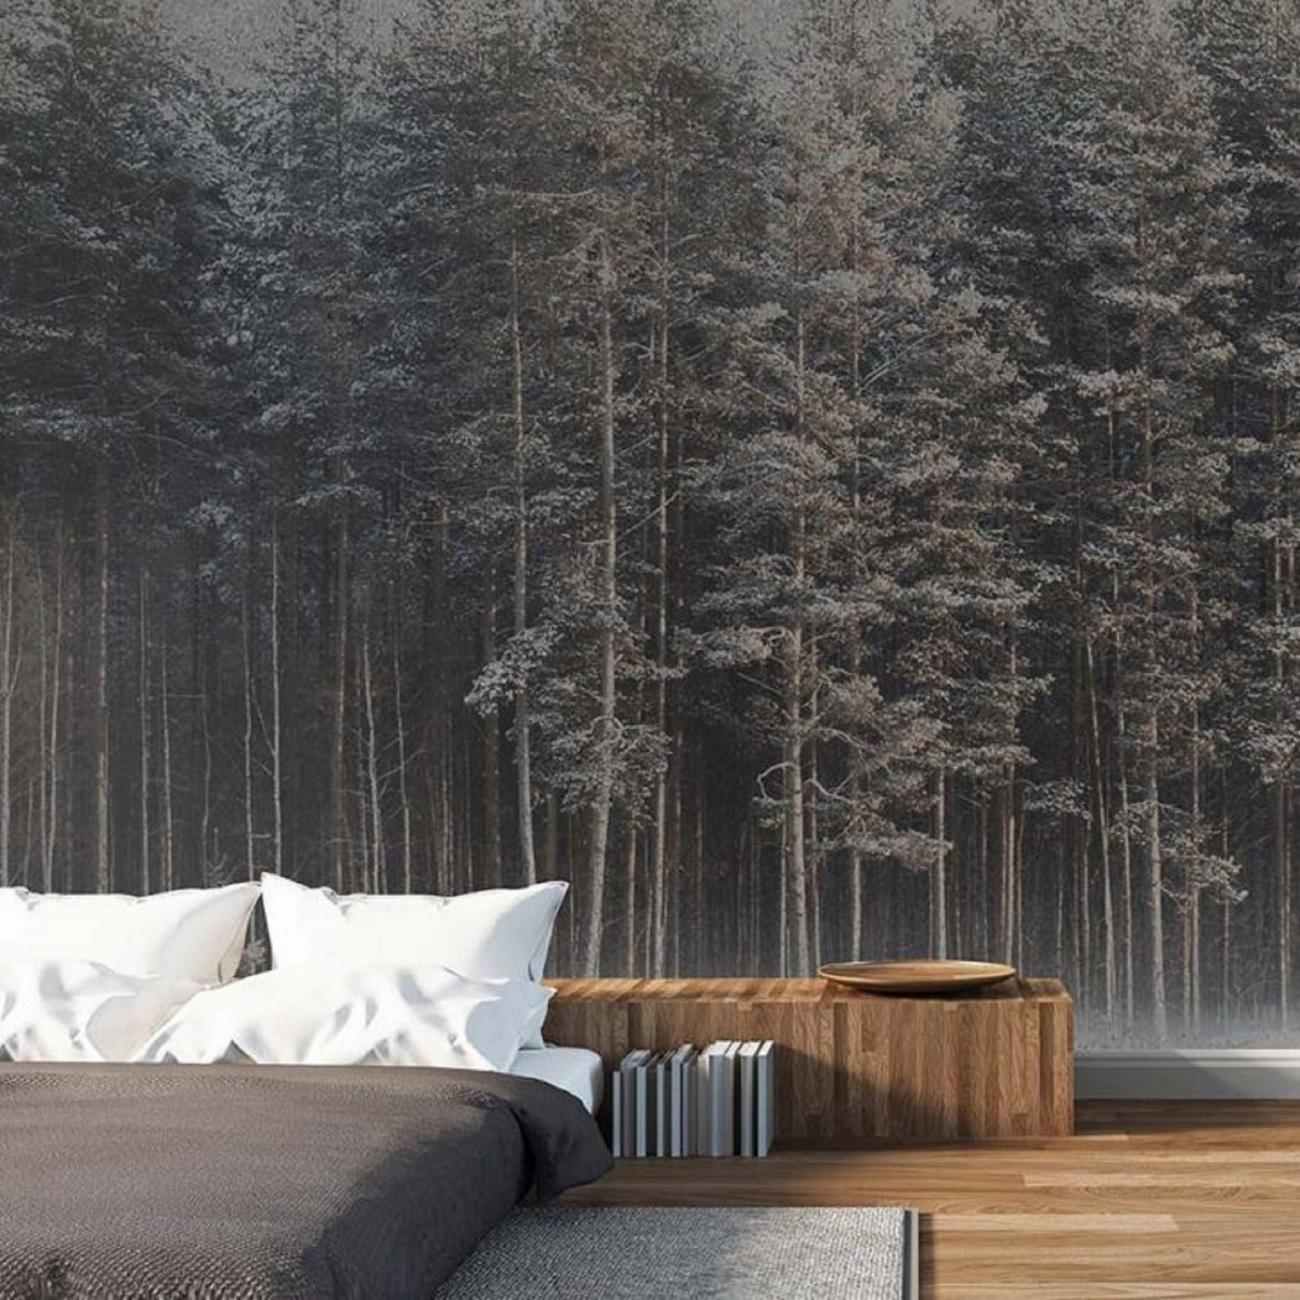 5000 Wallpaper Black Forest HD Terbaik